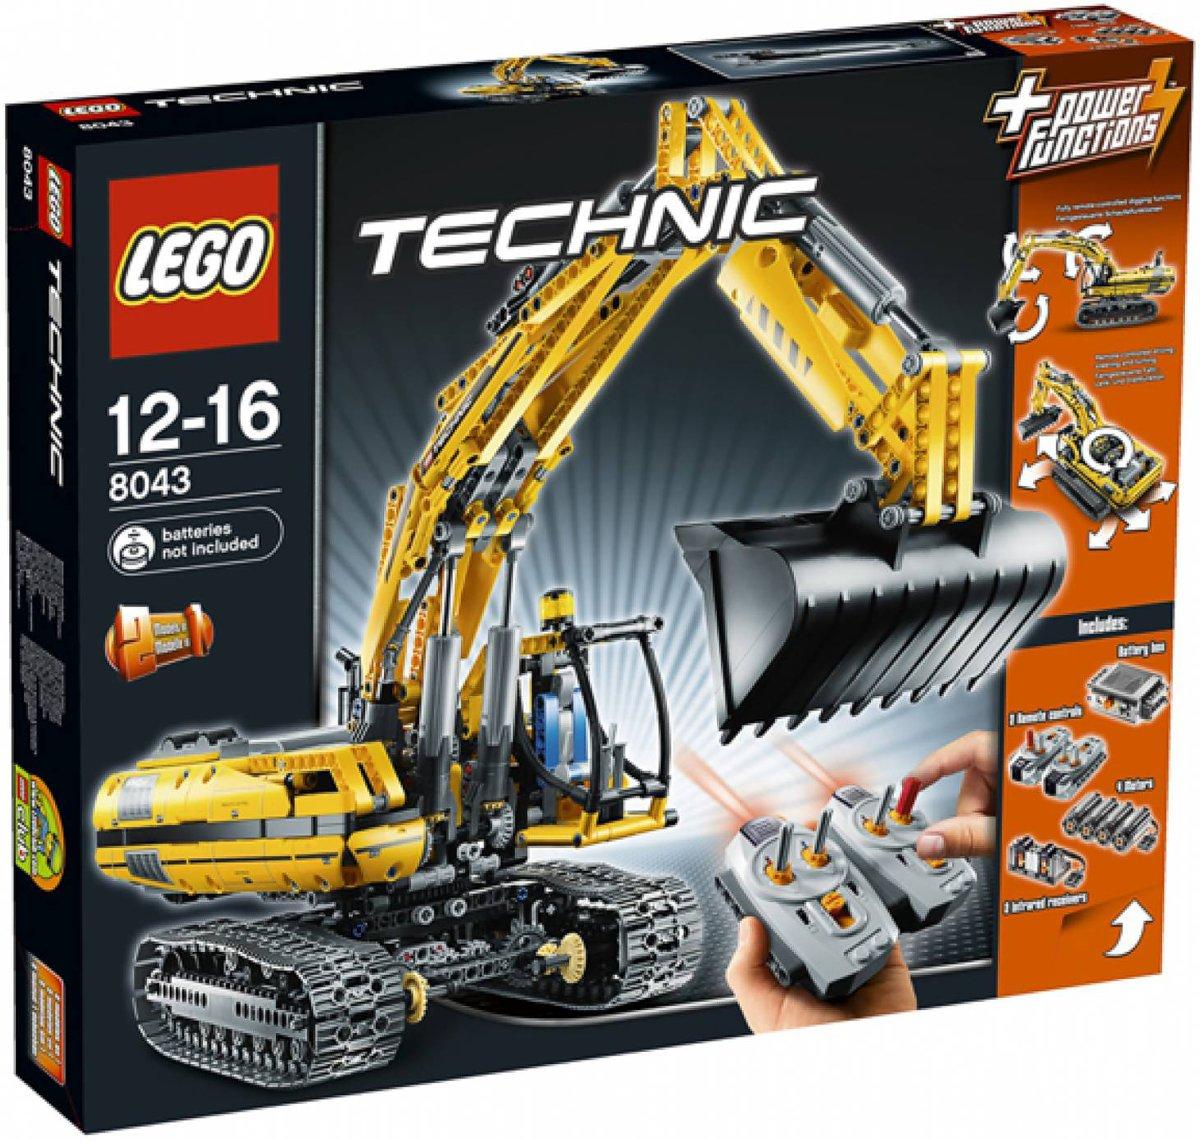 LEGO Technic Graafmachine met Motor - 8043